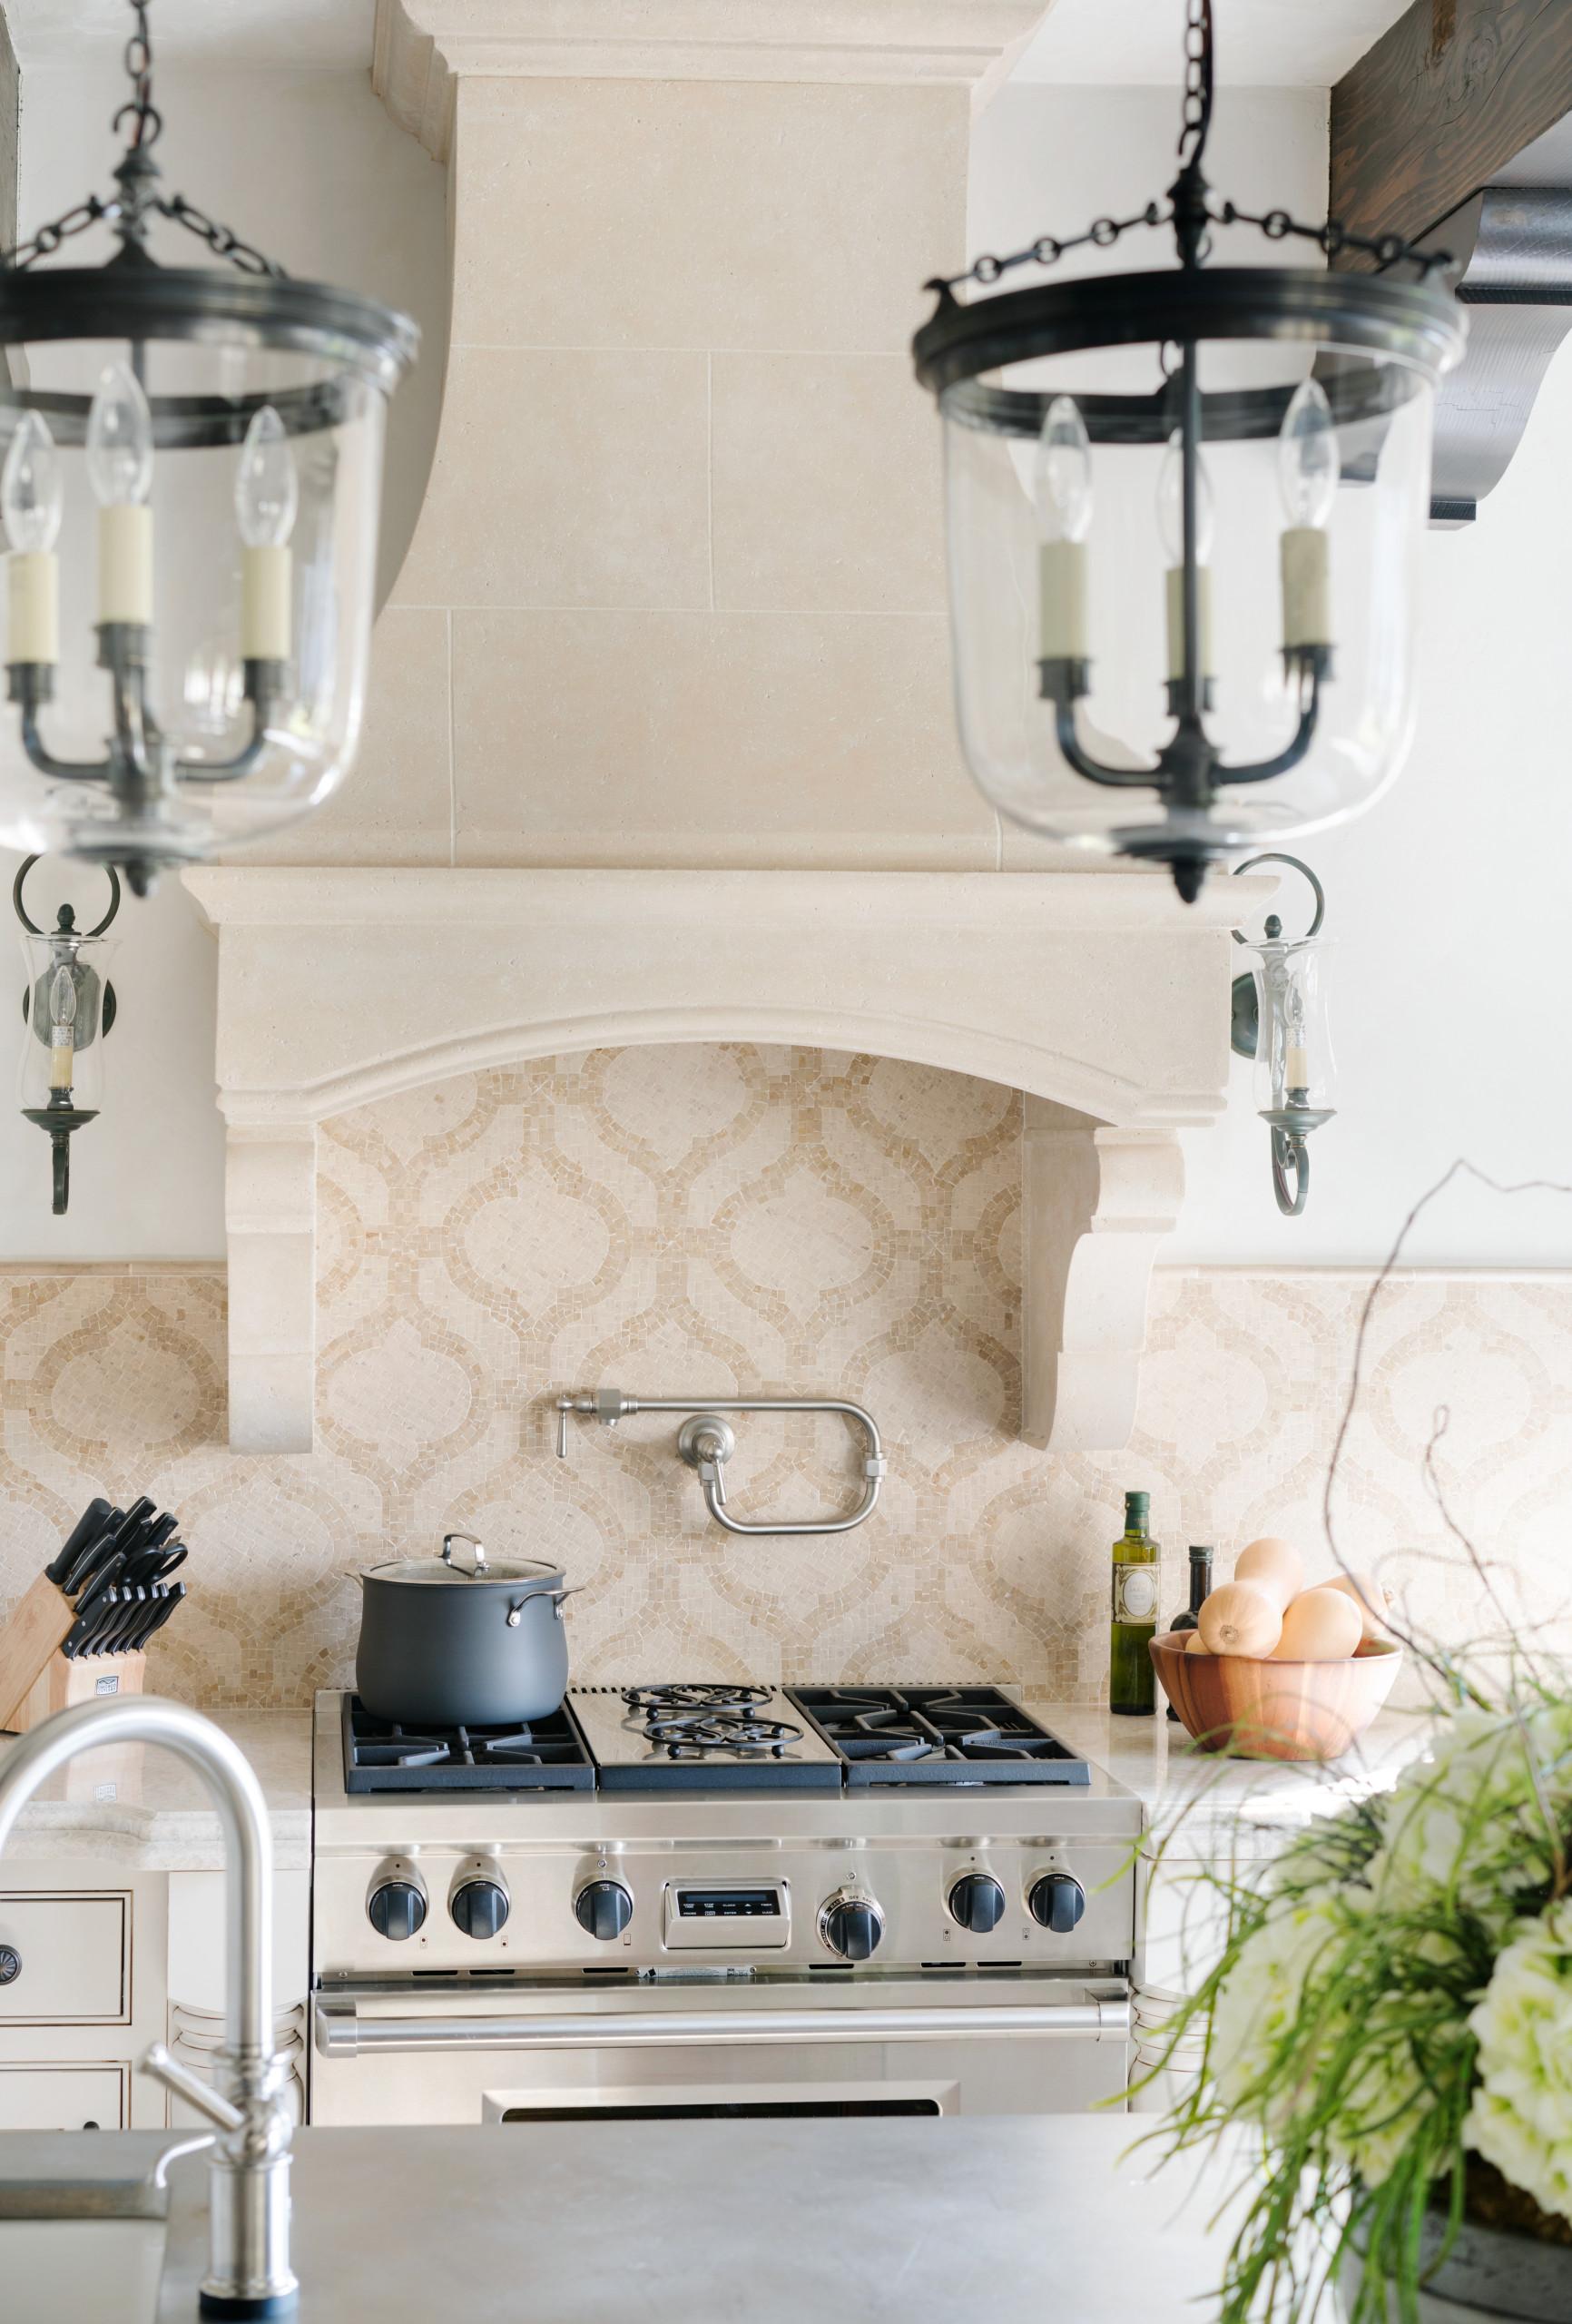 75 Beautiful Limestone Floor Kitchen With Mosaic Tile Backsplash Pictures Ideas November 2020 Houzz